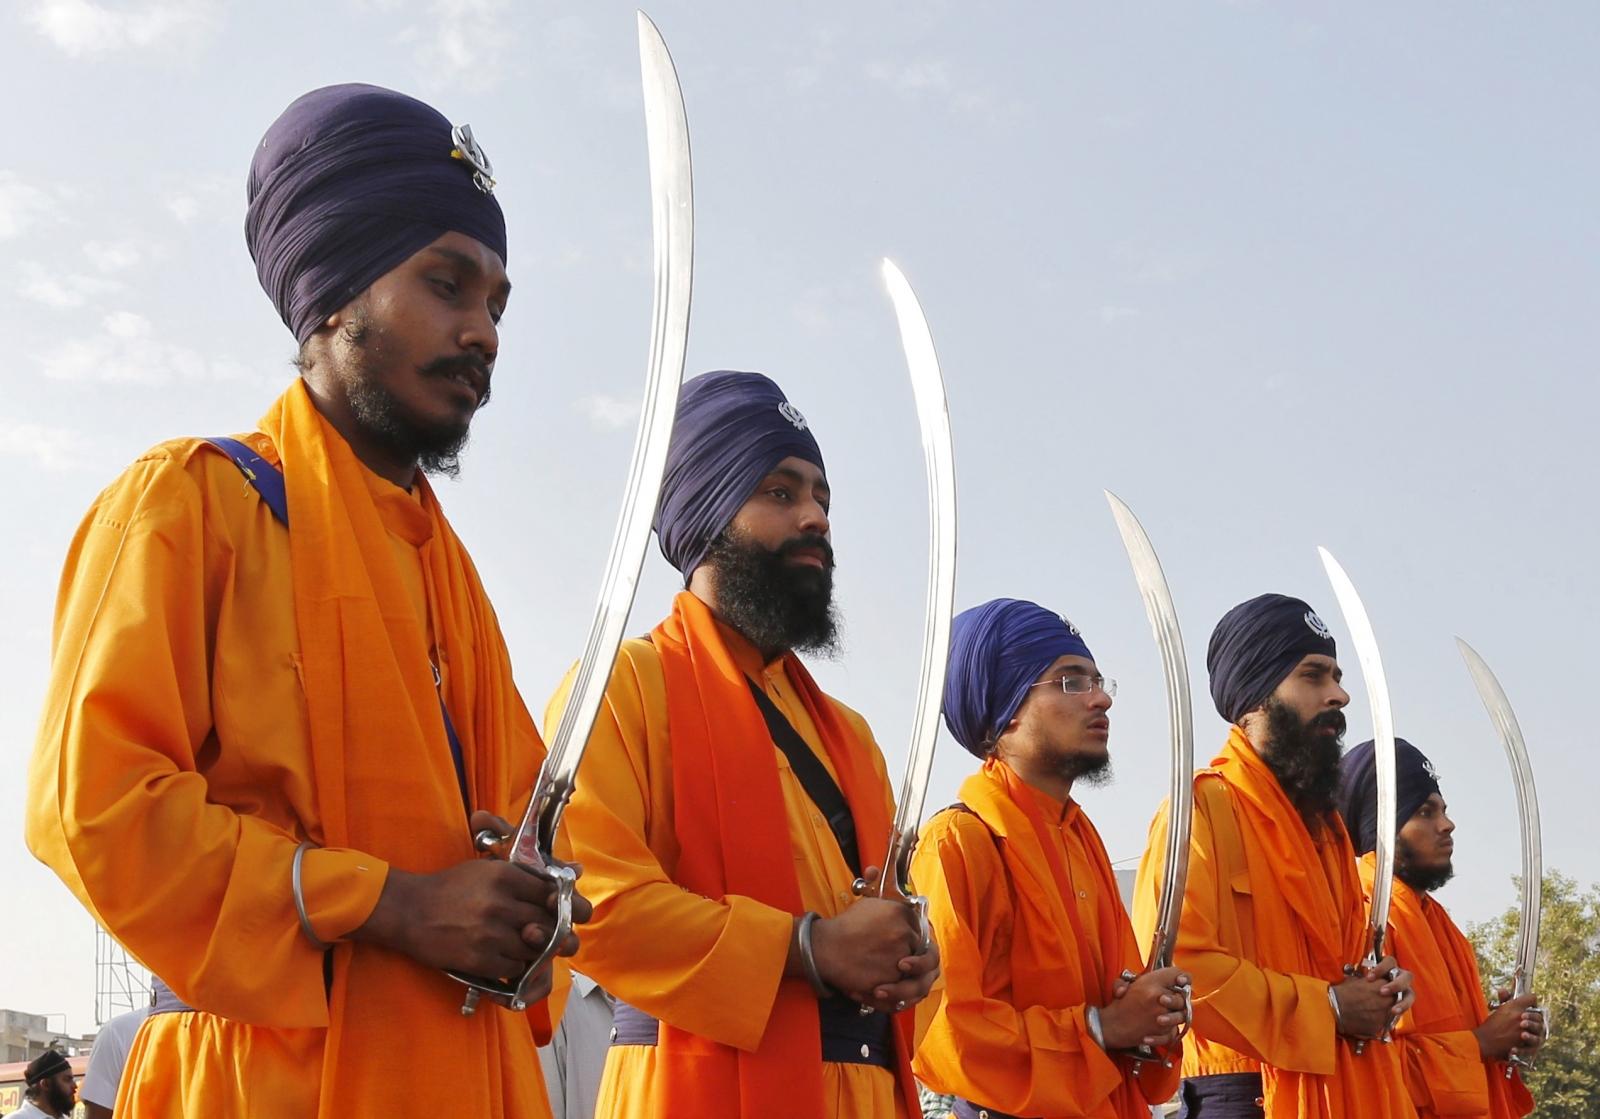 Sikh procession